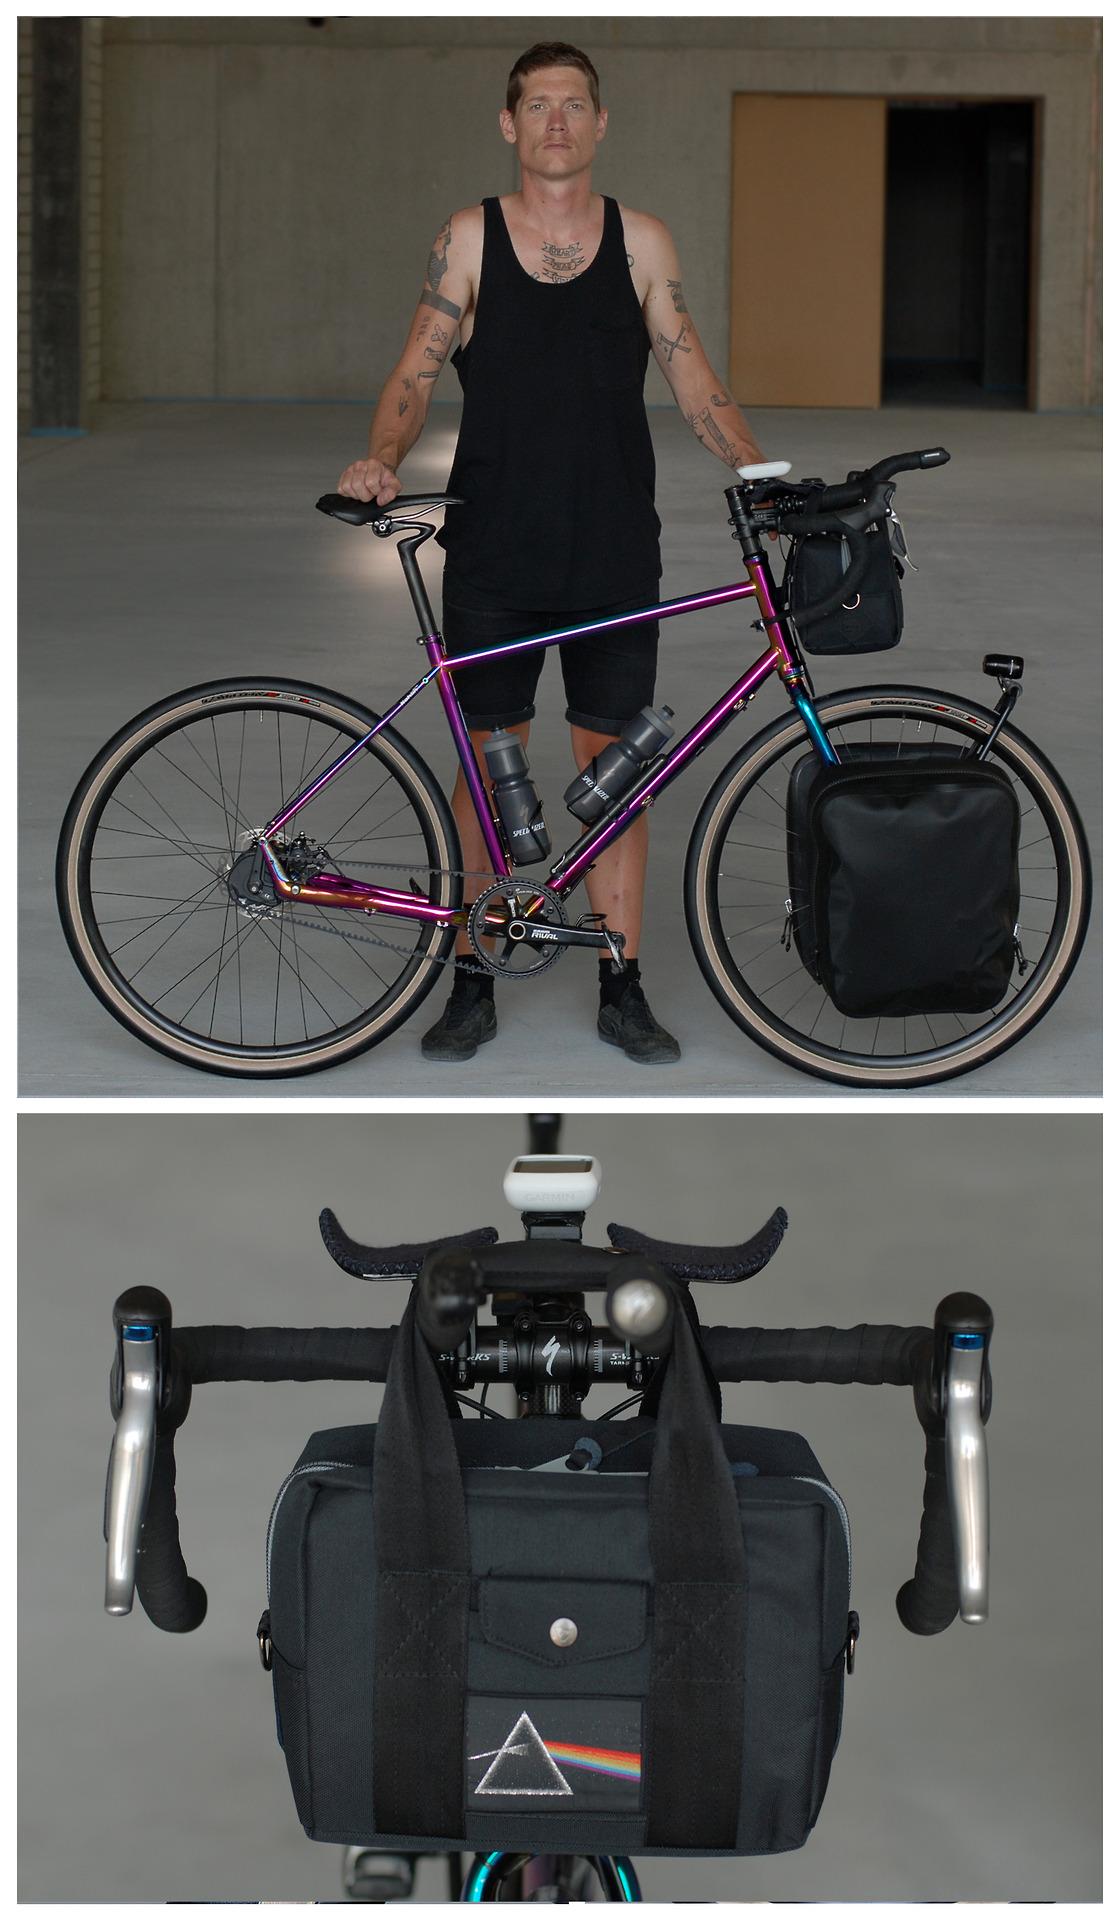 AWOL transcontinental bike